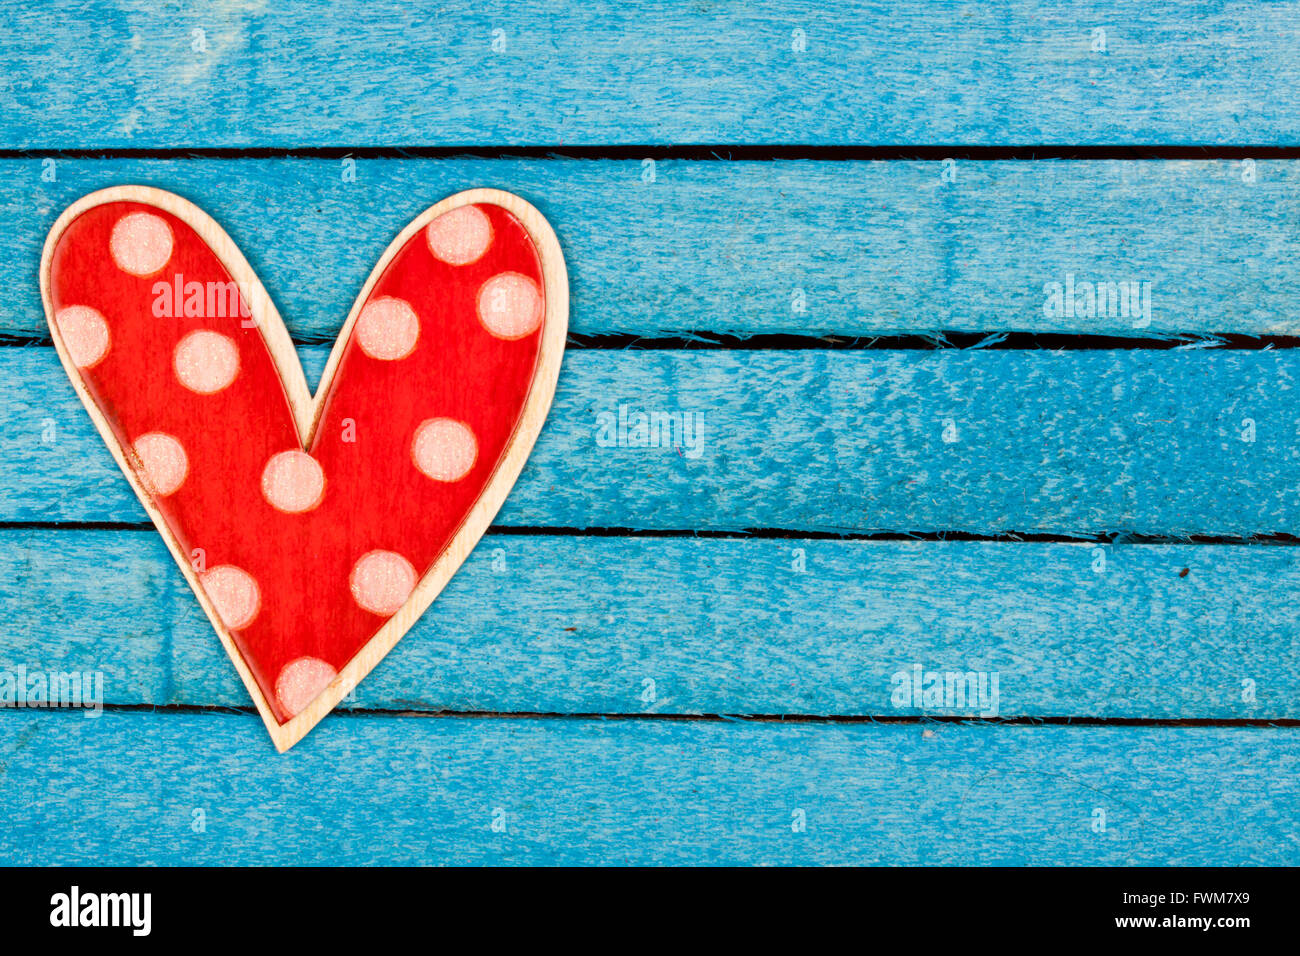 red polka dot heart - Stock Image